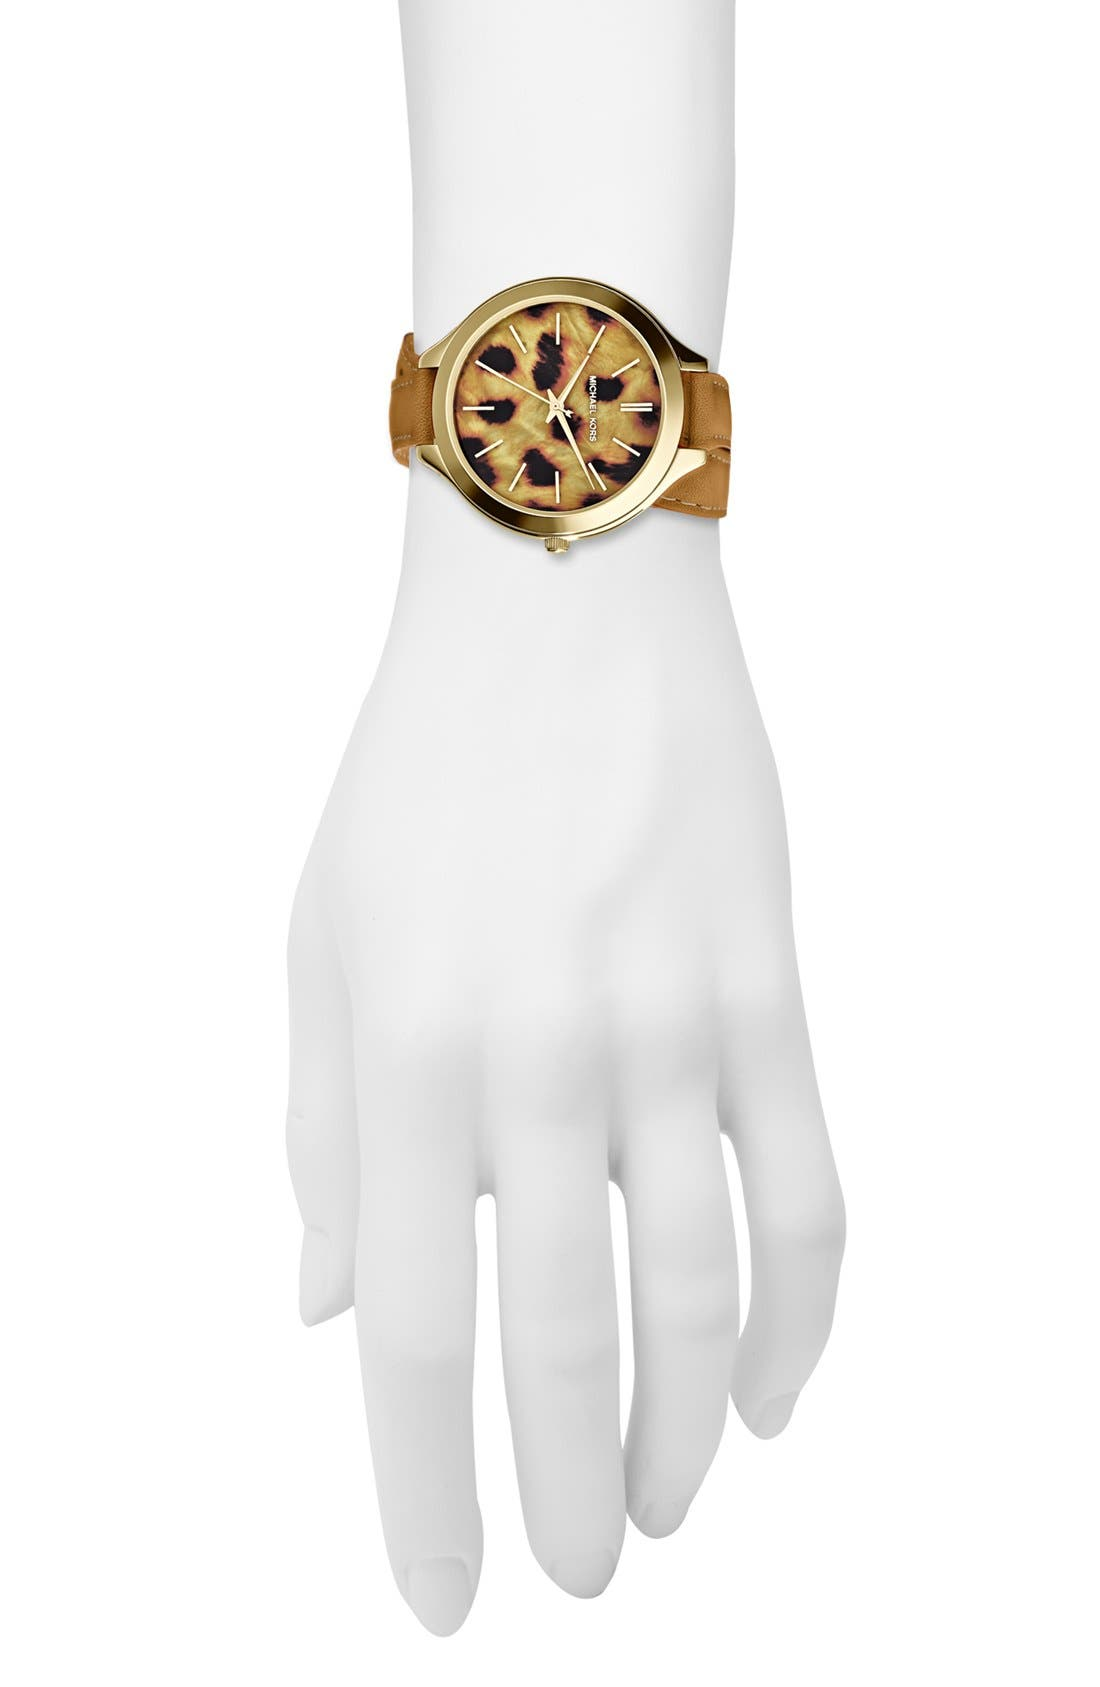 Alternate Image 4  - Michael Kors 'Slim Runway' Cheetah Dial Leather Wrap Watch, 42mm